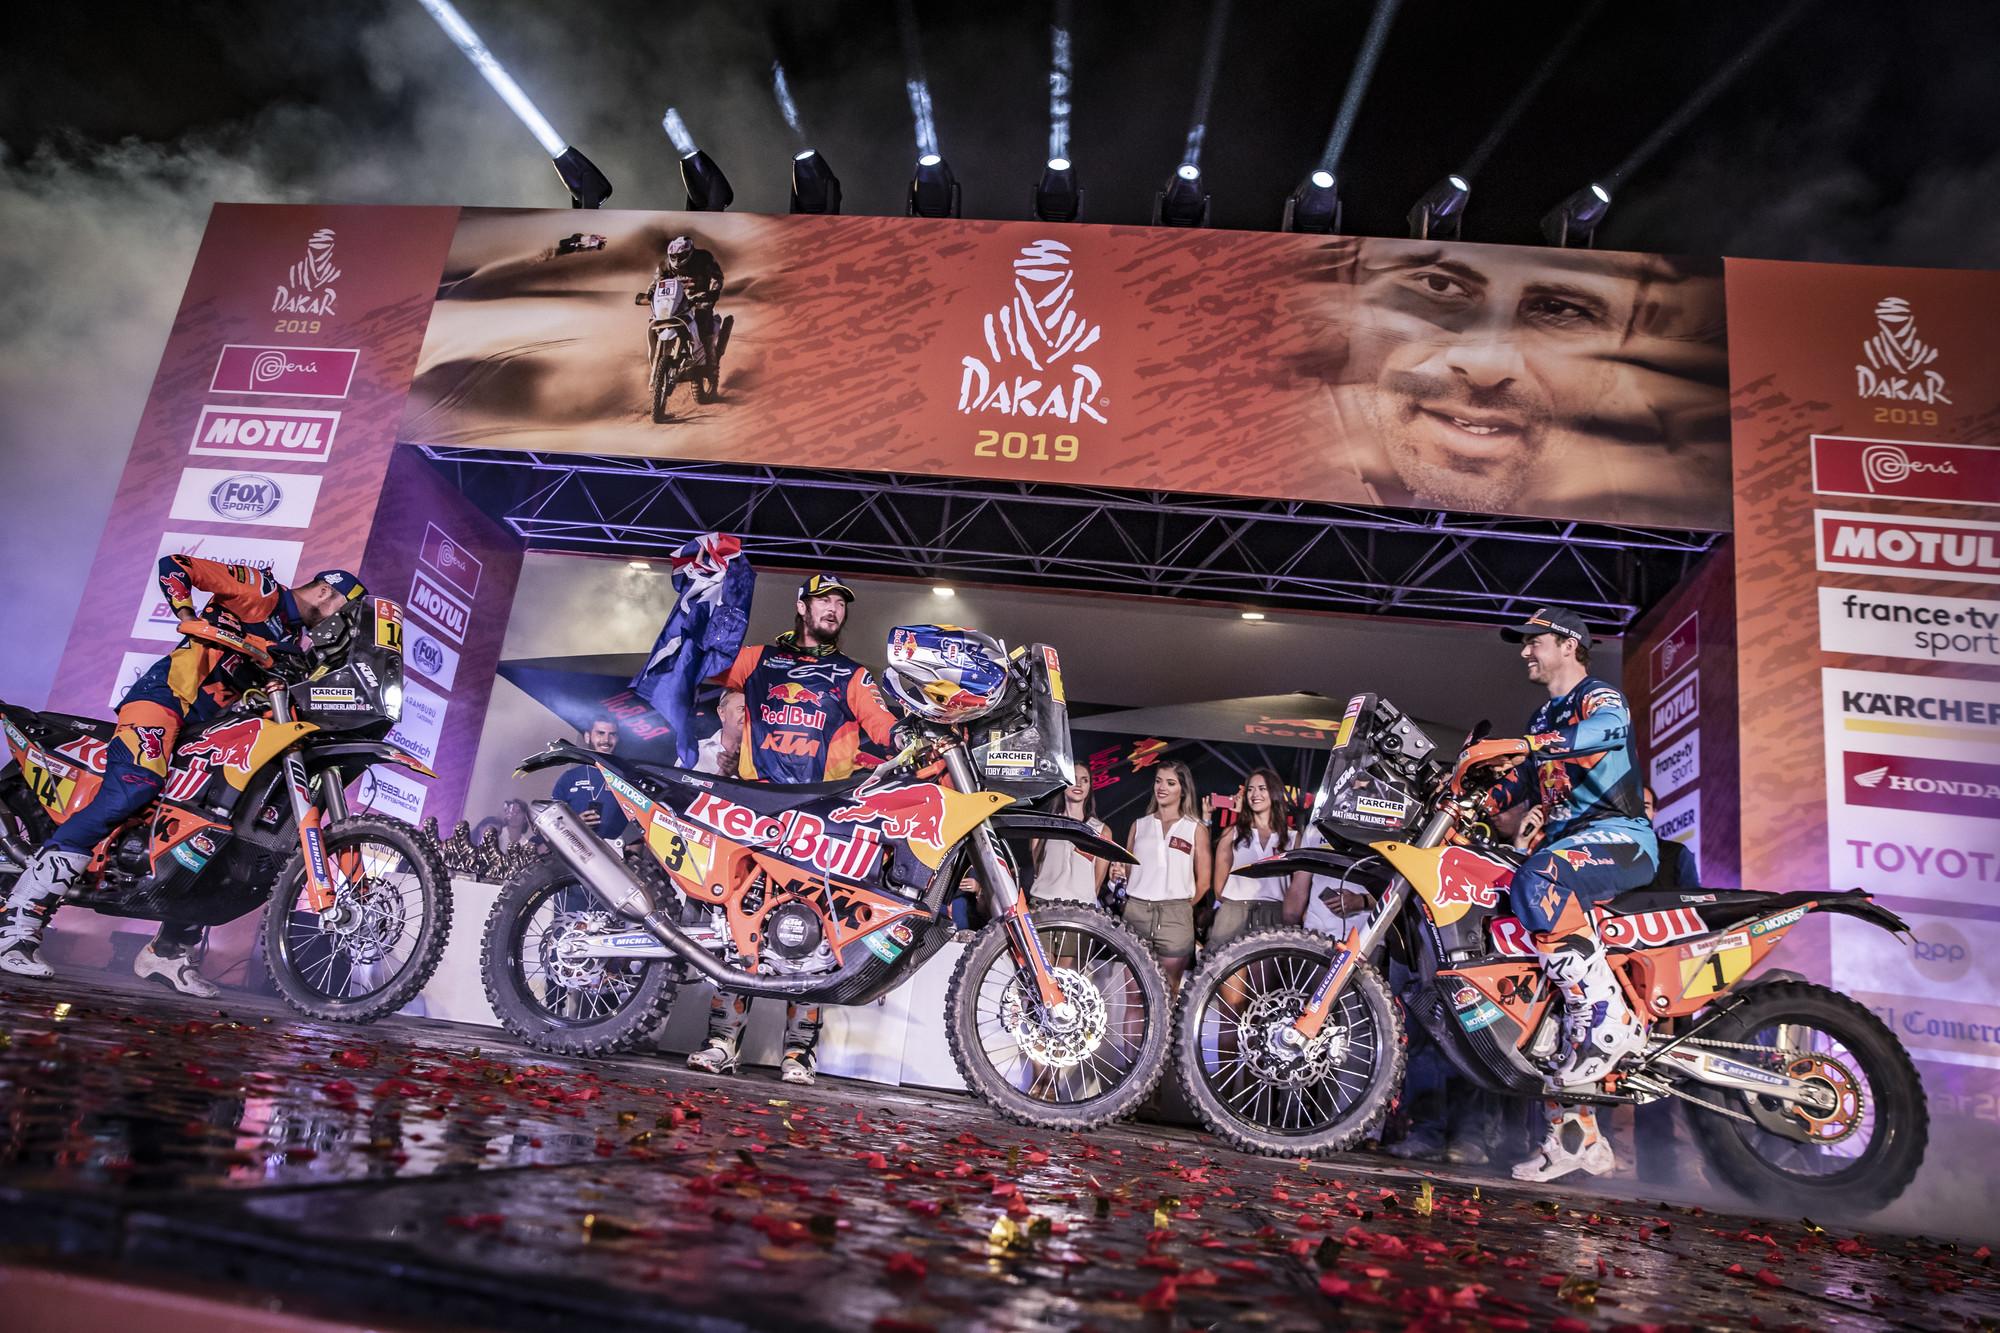 263411_misc_finish_Red Bull KTM Factory Racing_Dakar2019_485.jpg